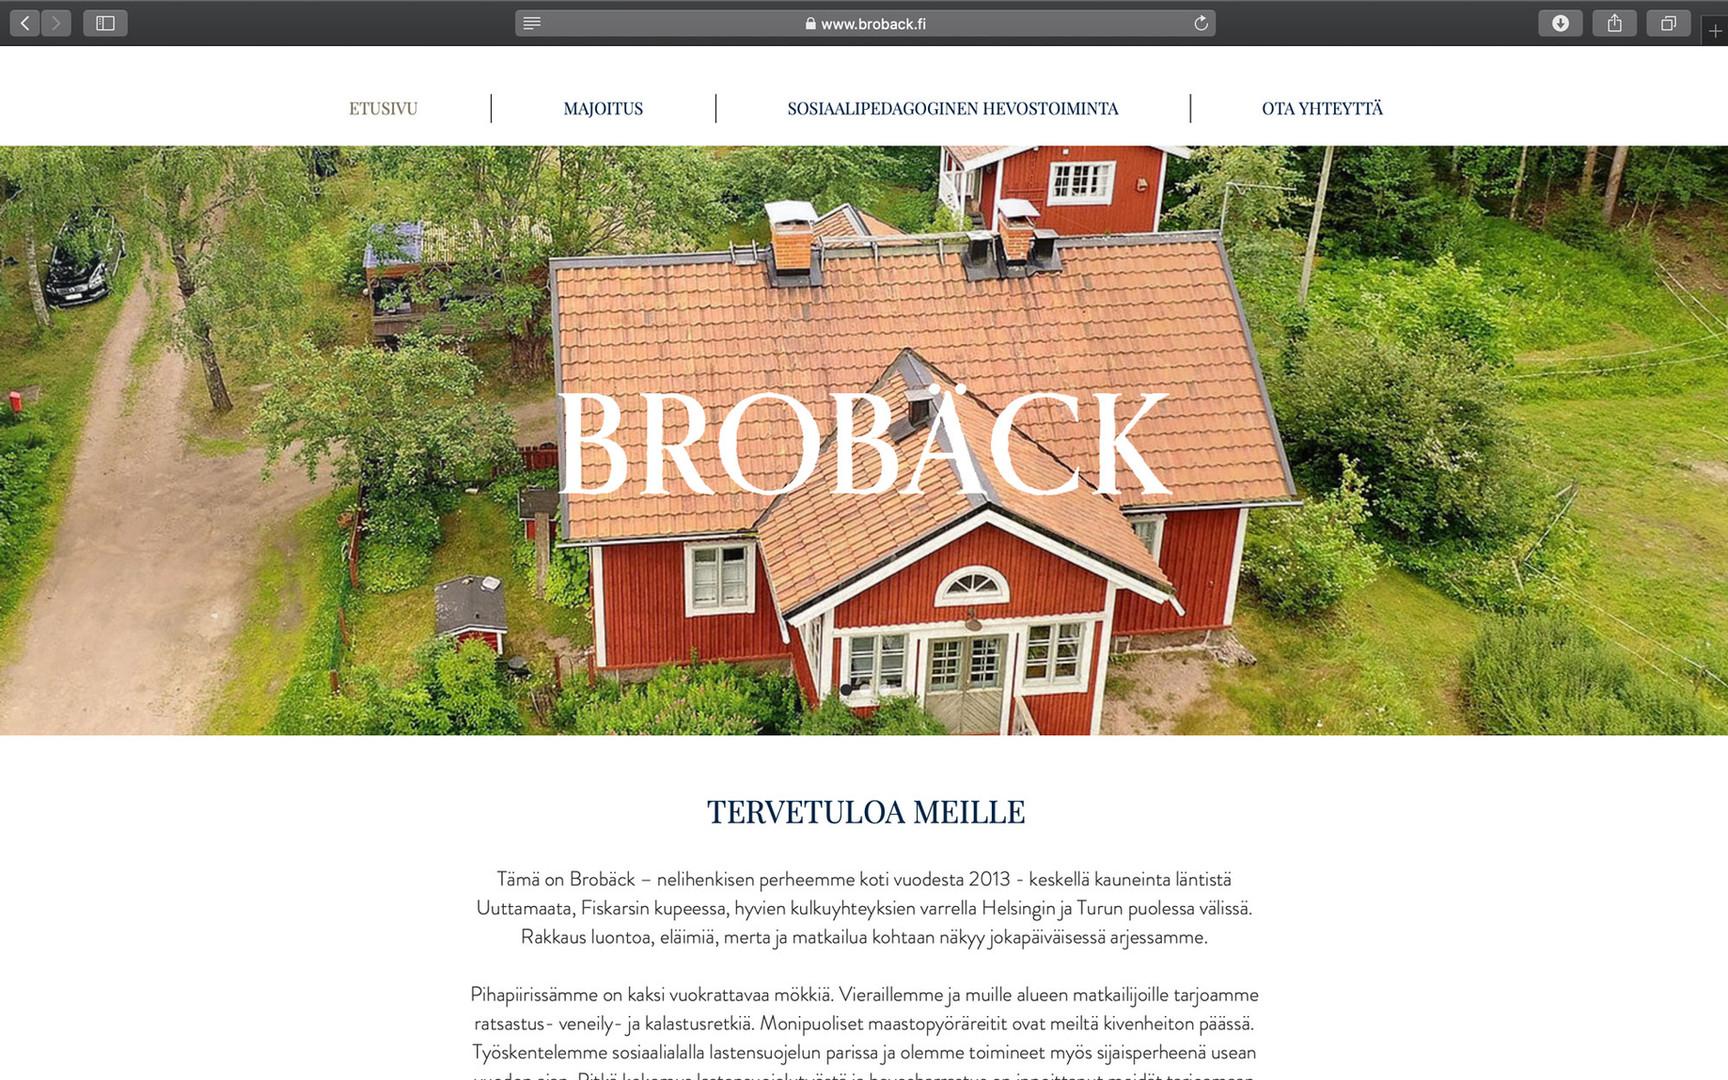 broback.fi